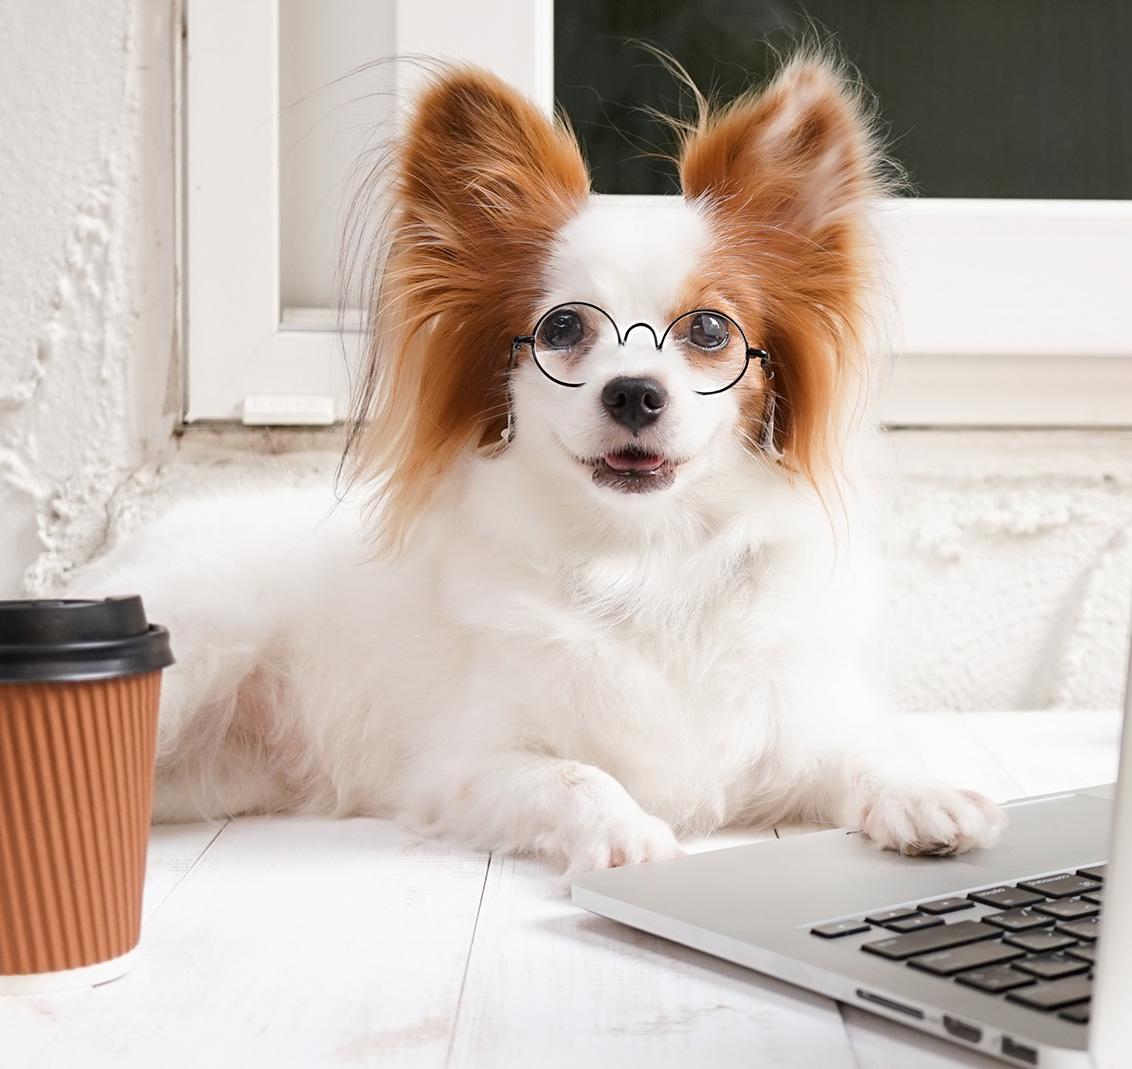 Impressum Freude am Hund